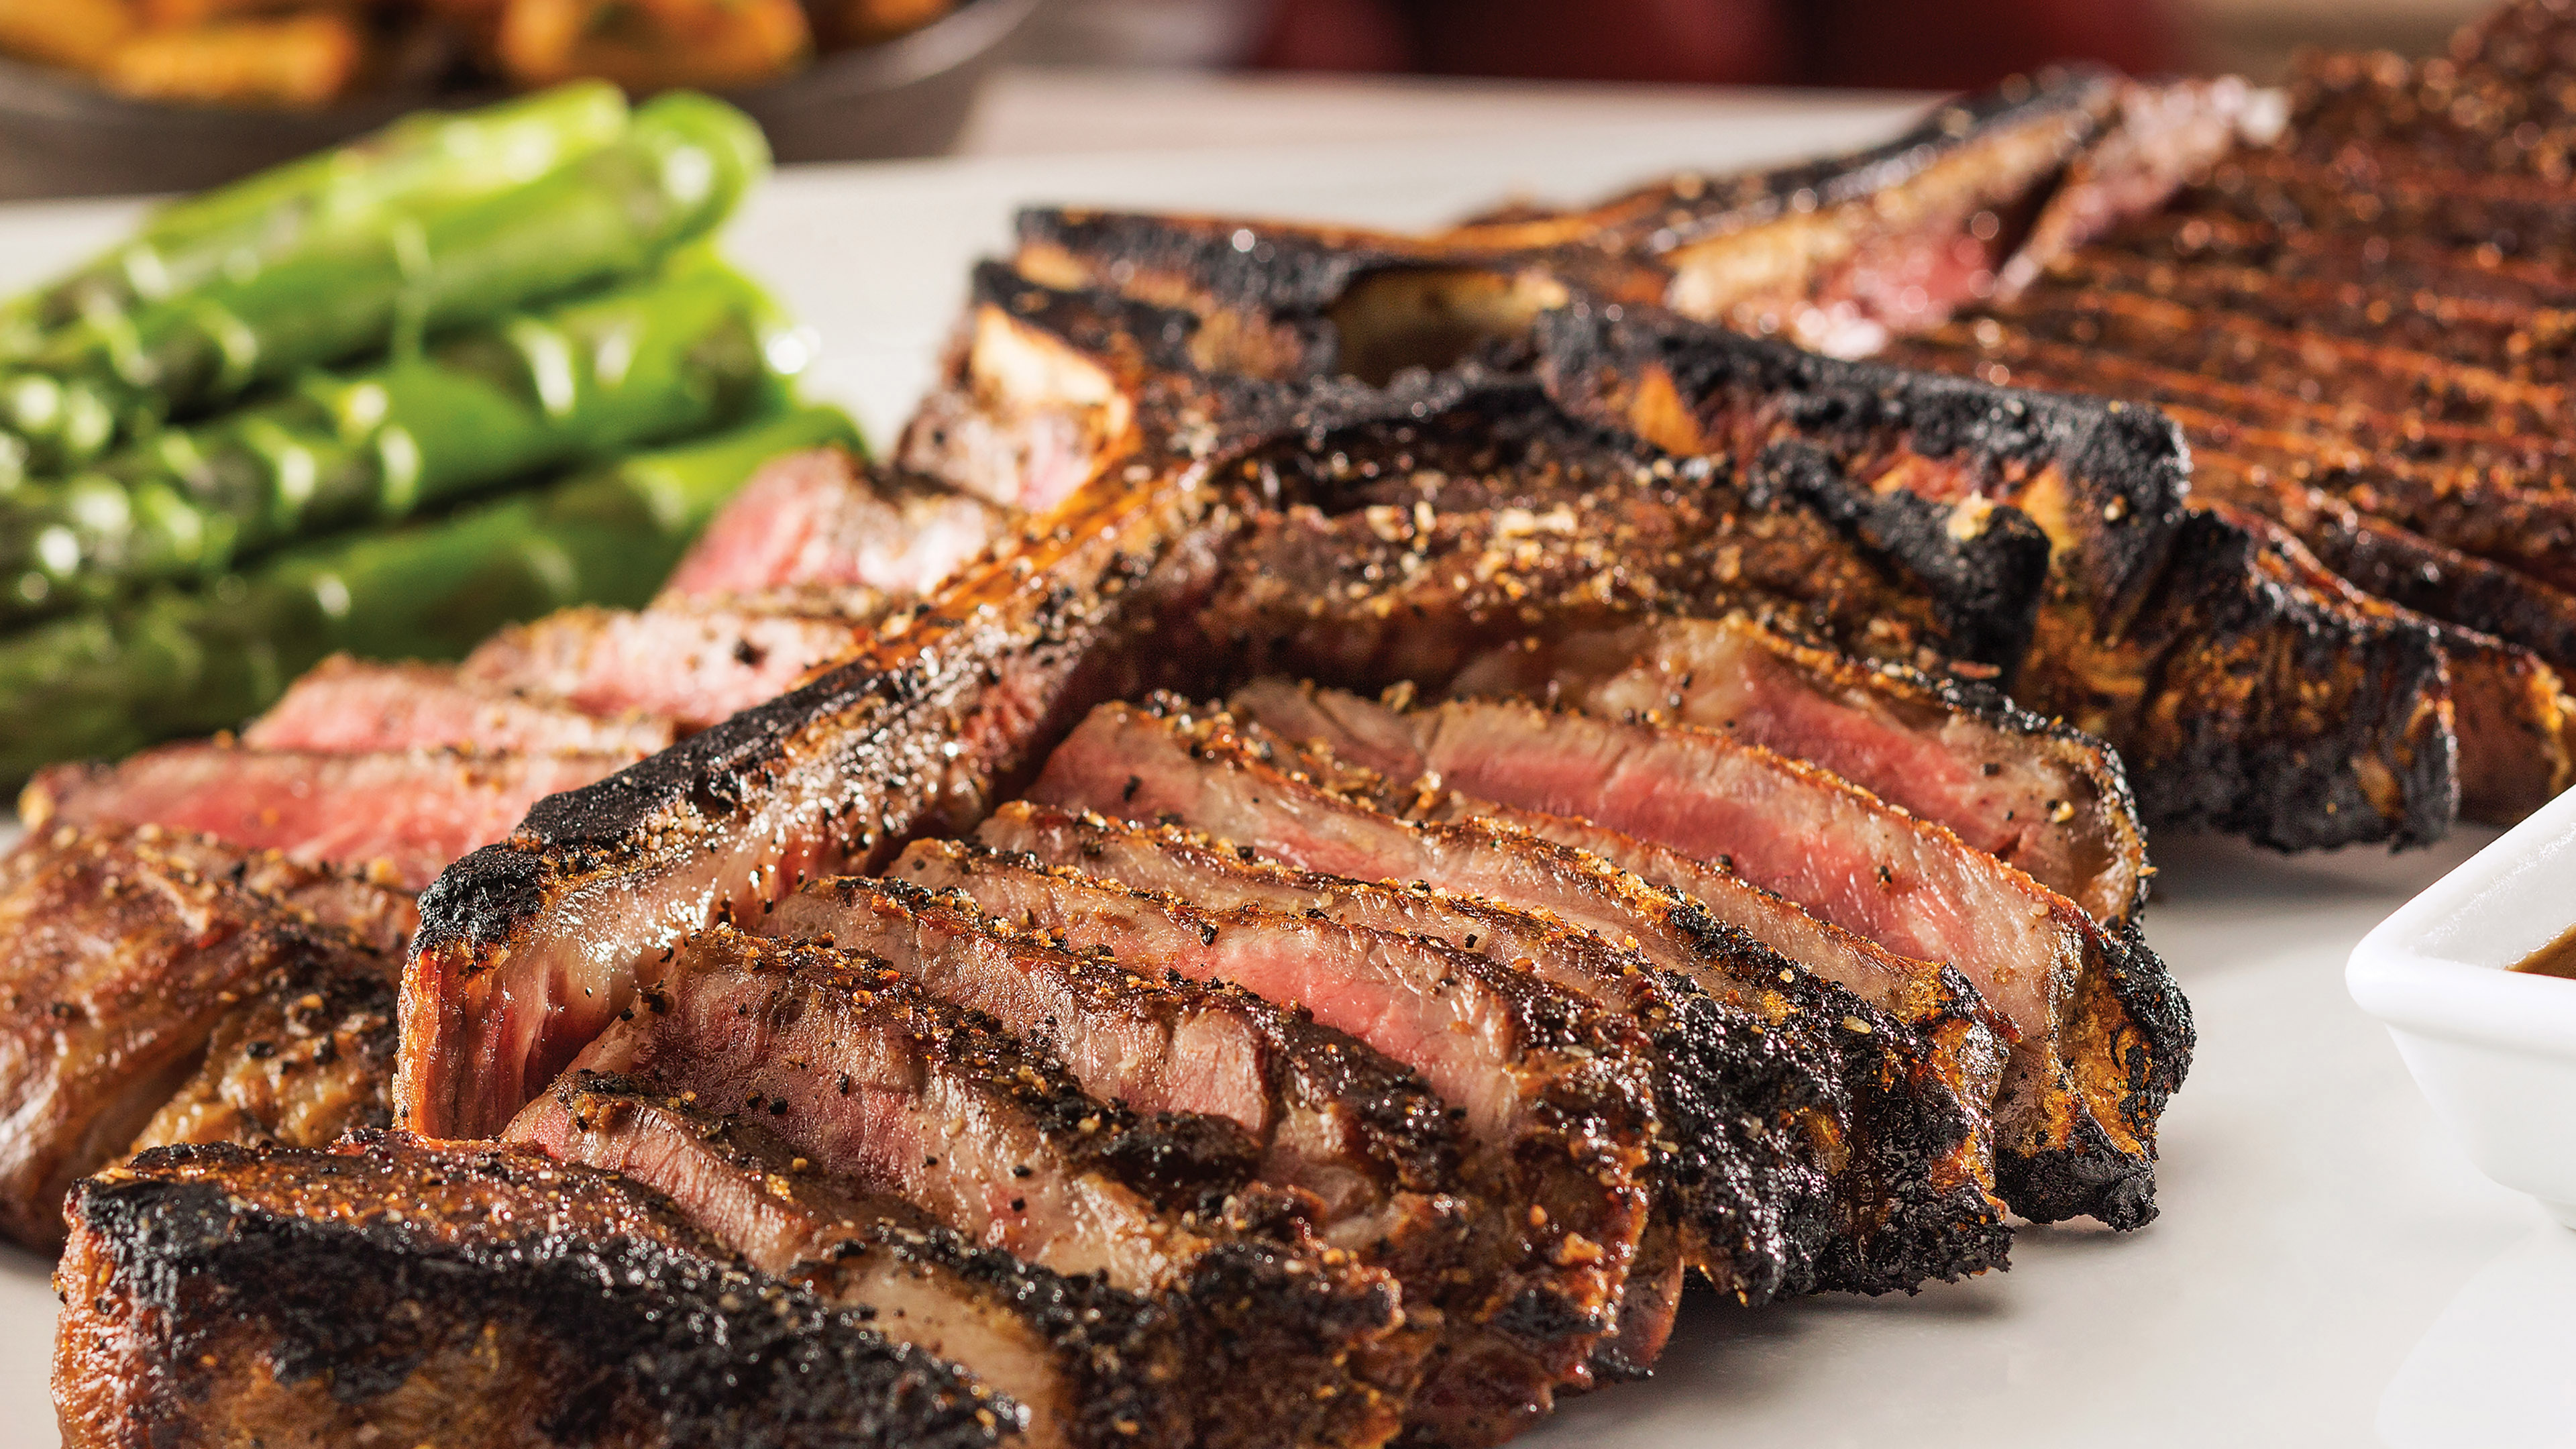 Mj88 steakhouse food delicious for Minimal art nedir